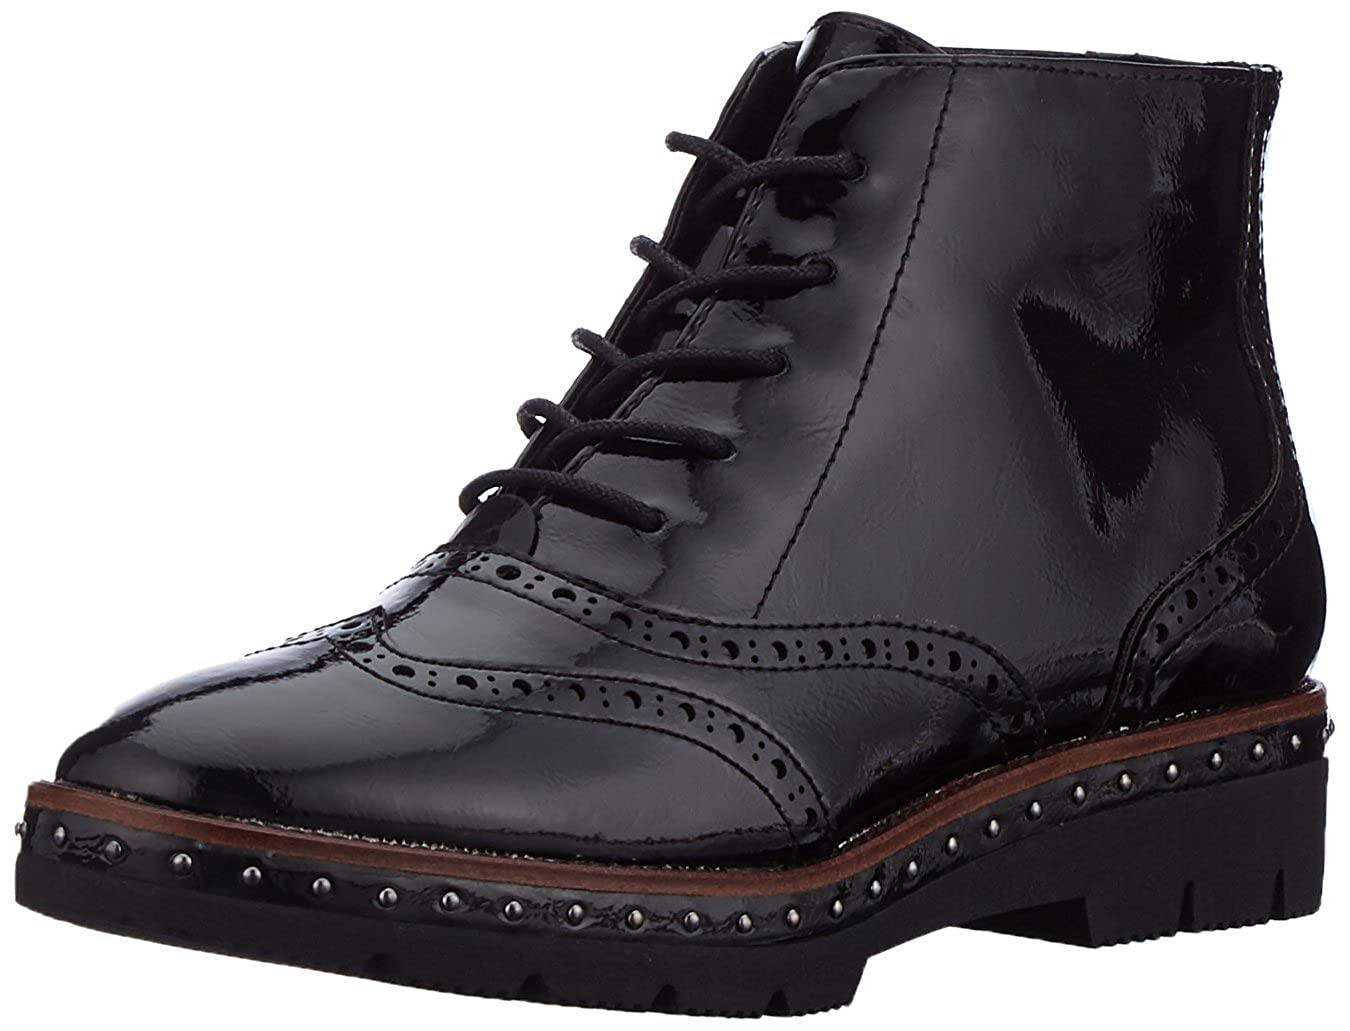 buy popular 7551c 8568b MARCO TOZZI Damen 25258 Combat Stiefel 3b6f4uchu9619-Stiefel ...